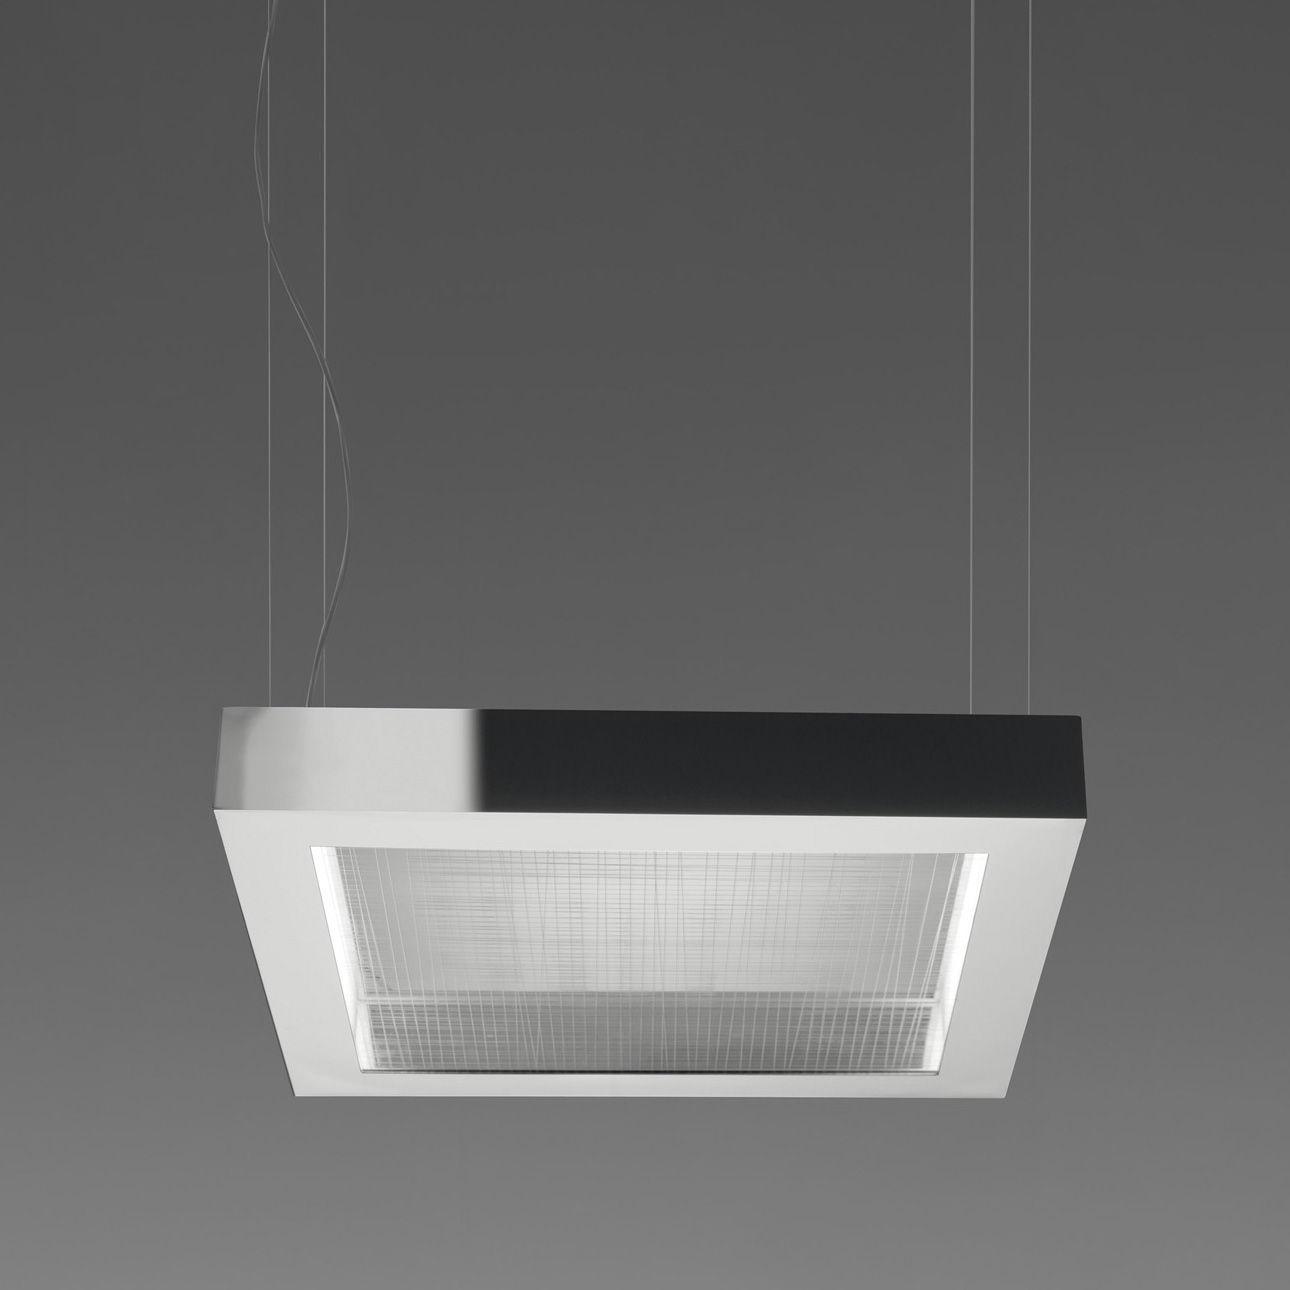 kit de suspension pour applique altrove acier artemide made in design. Black Bedroom Furniture Sets. Home Design Ideas